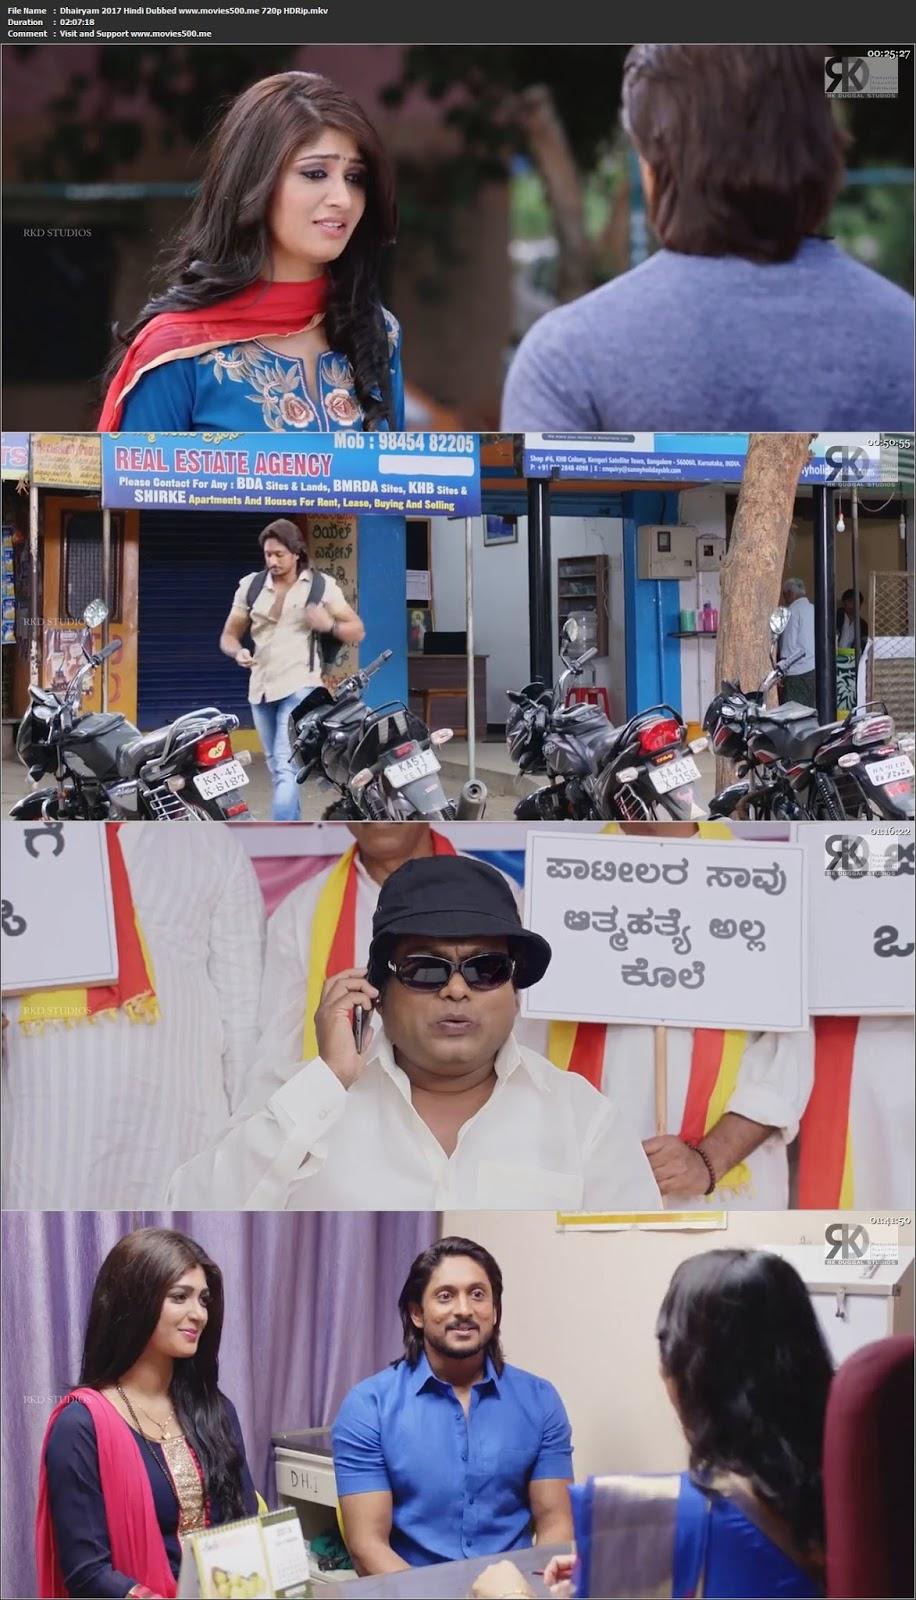 Dhairyam 2017 Hindi Dubbed Full Movie HDRip 720p at movies500.me